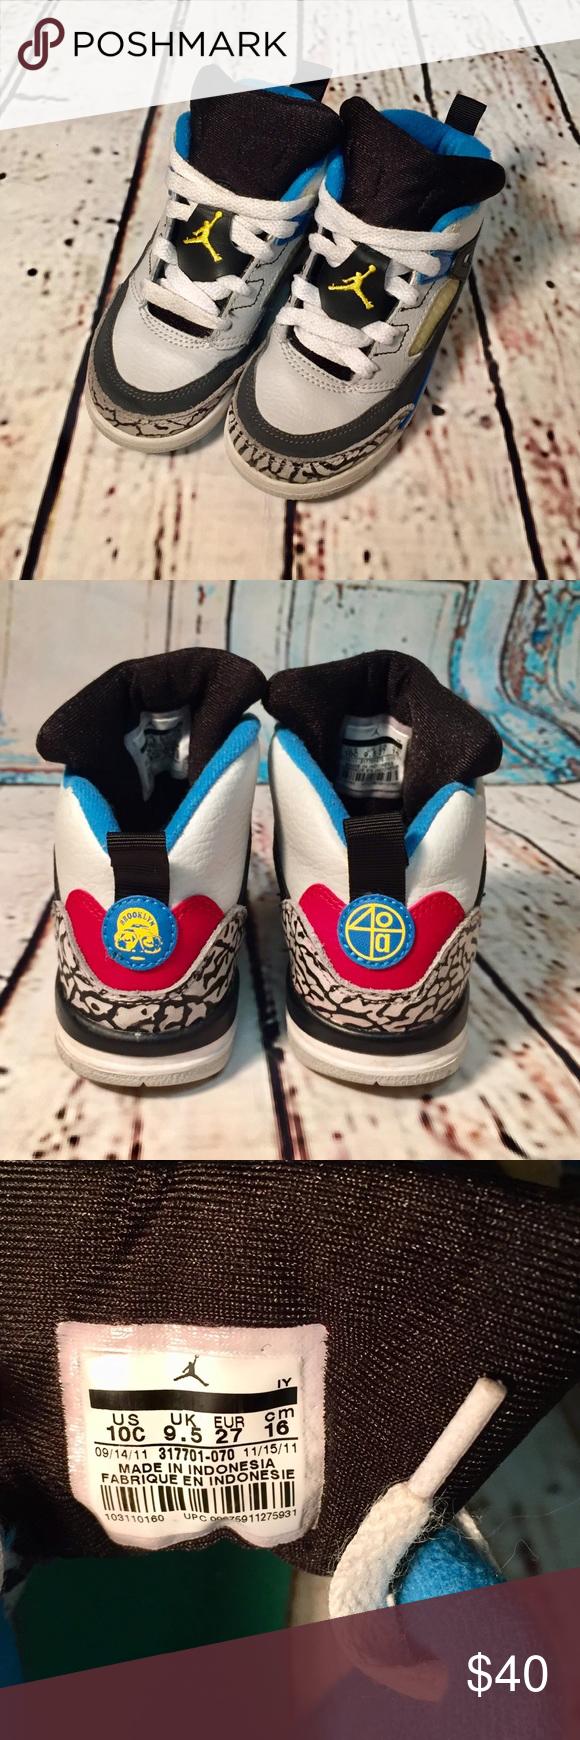 Nike Air Jordan Retro Brooklyn 40a sz: 10c Excellent Used Condition ...